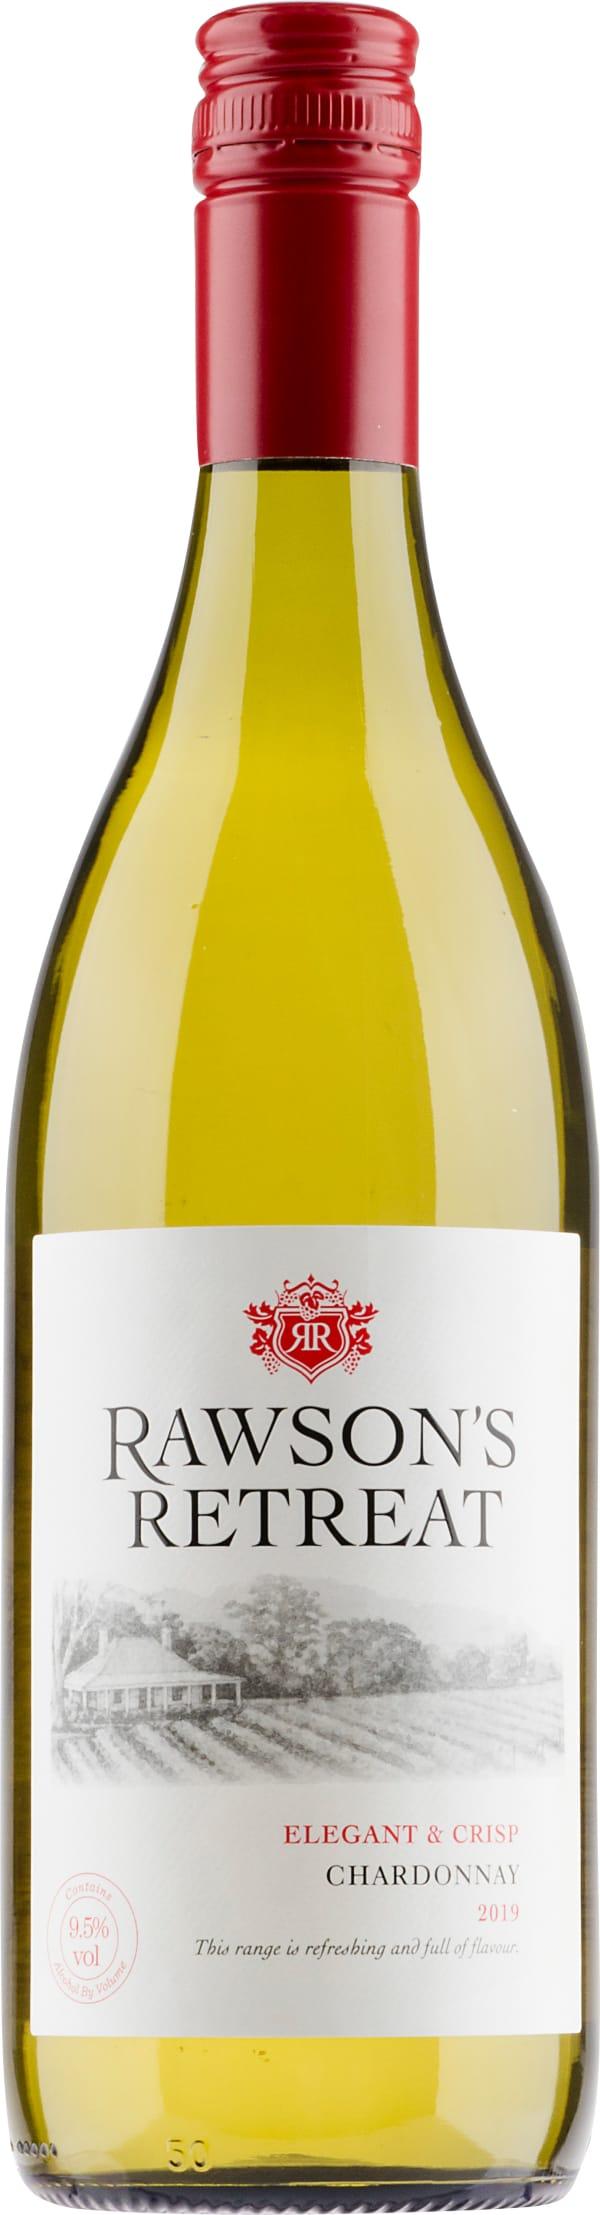 Rawson's Retreat Chardonnay 2019